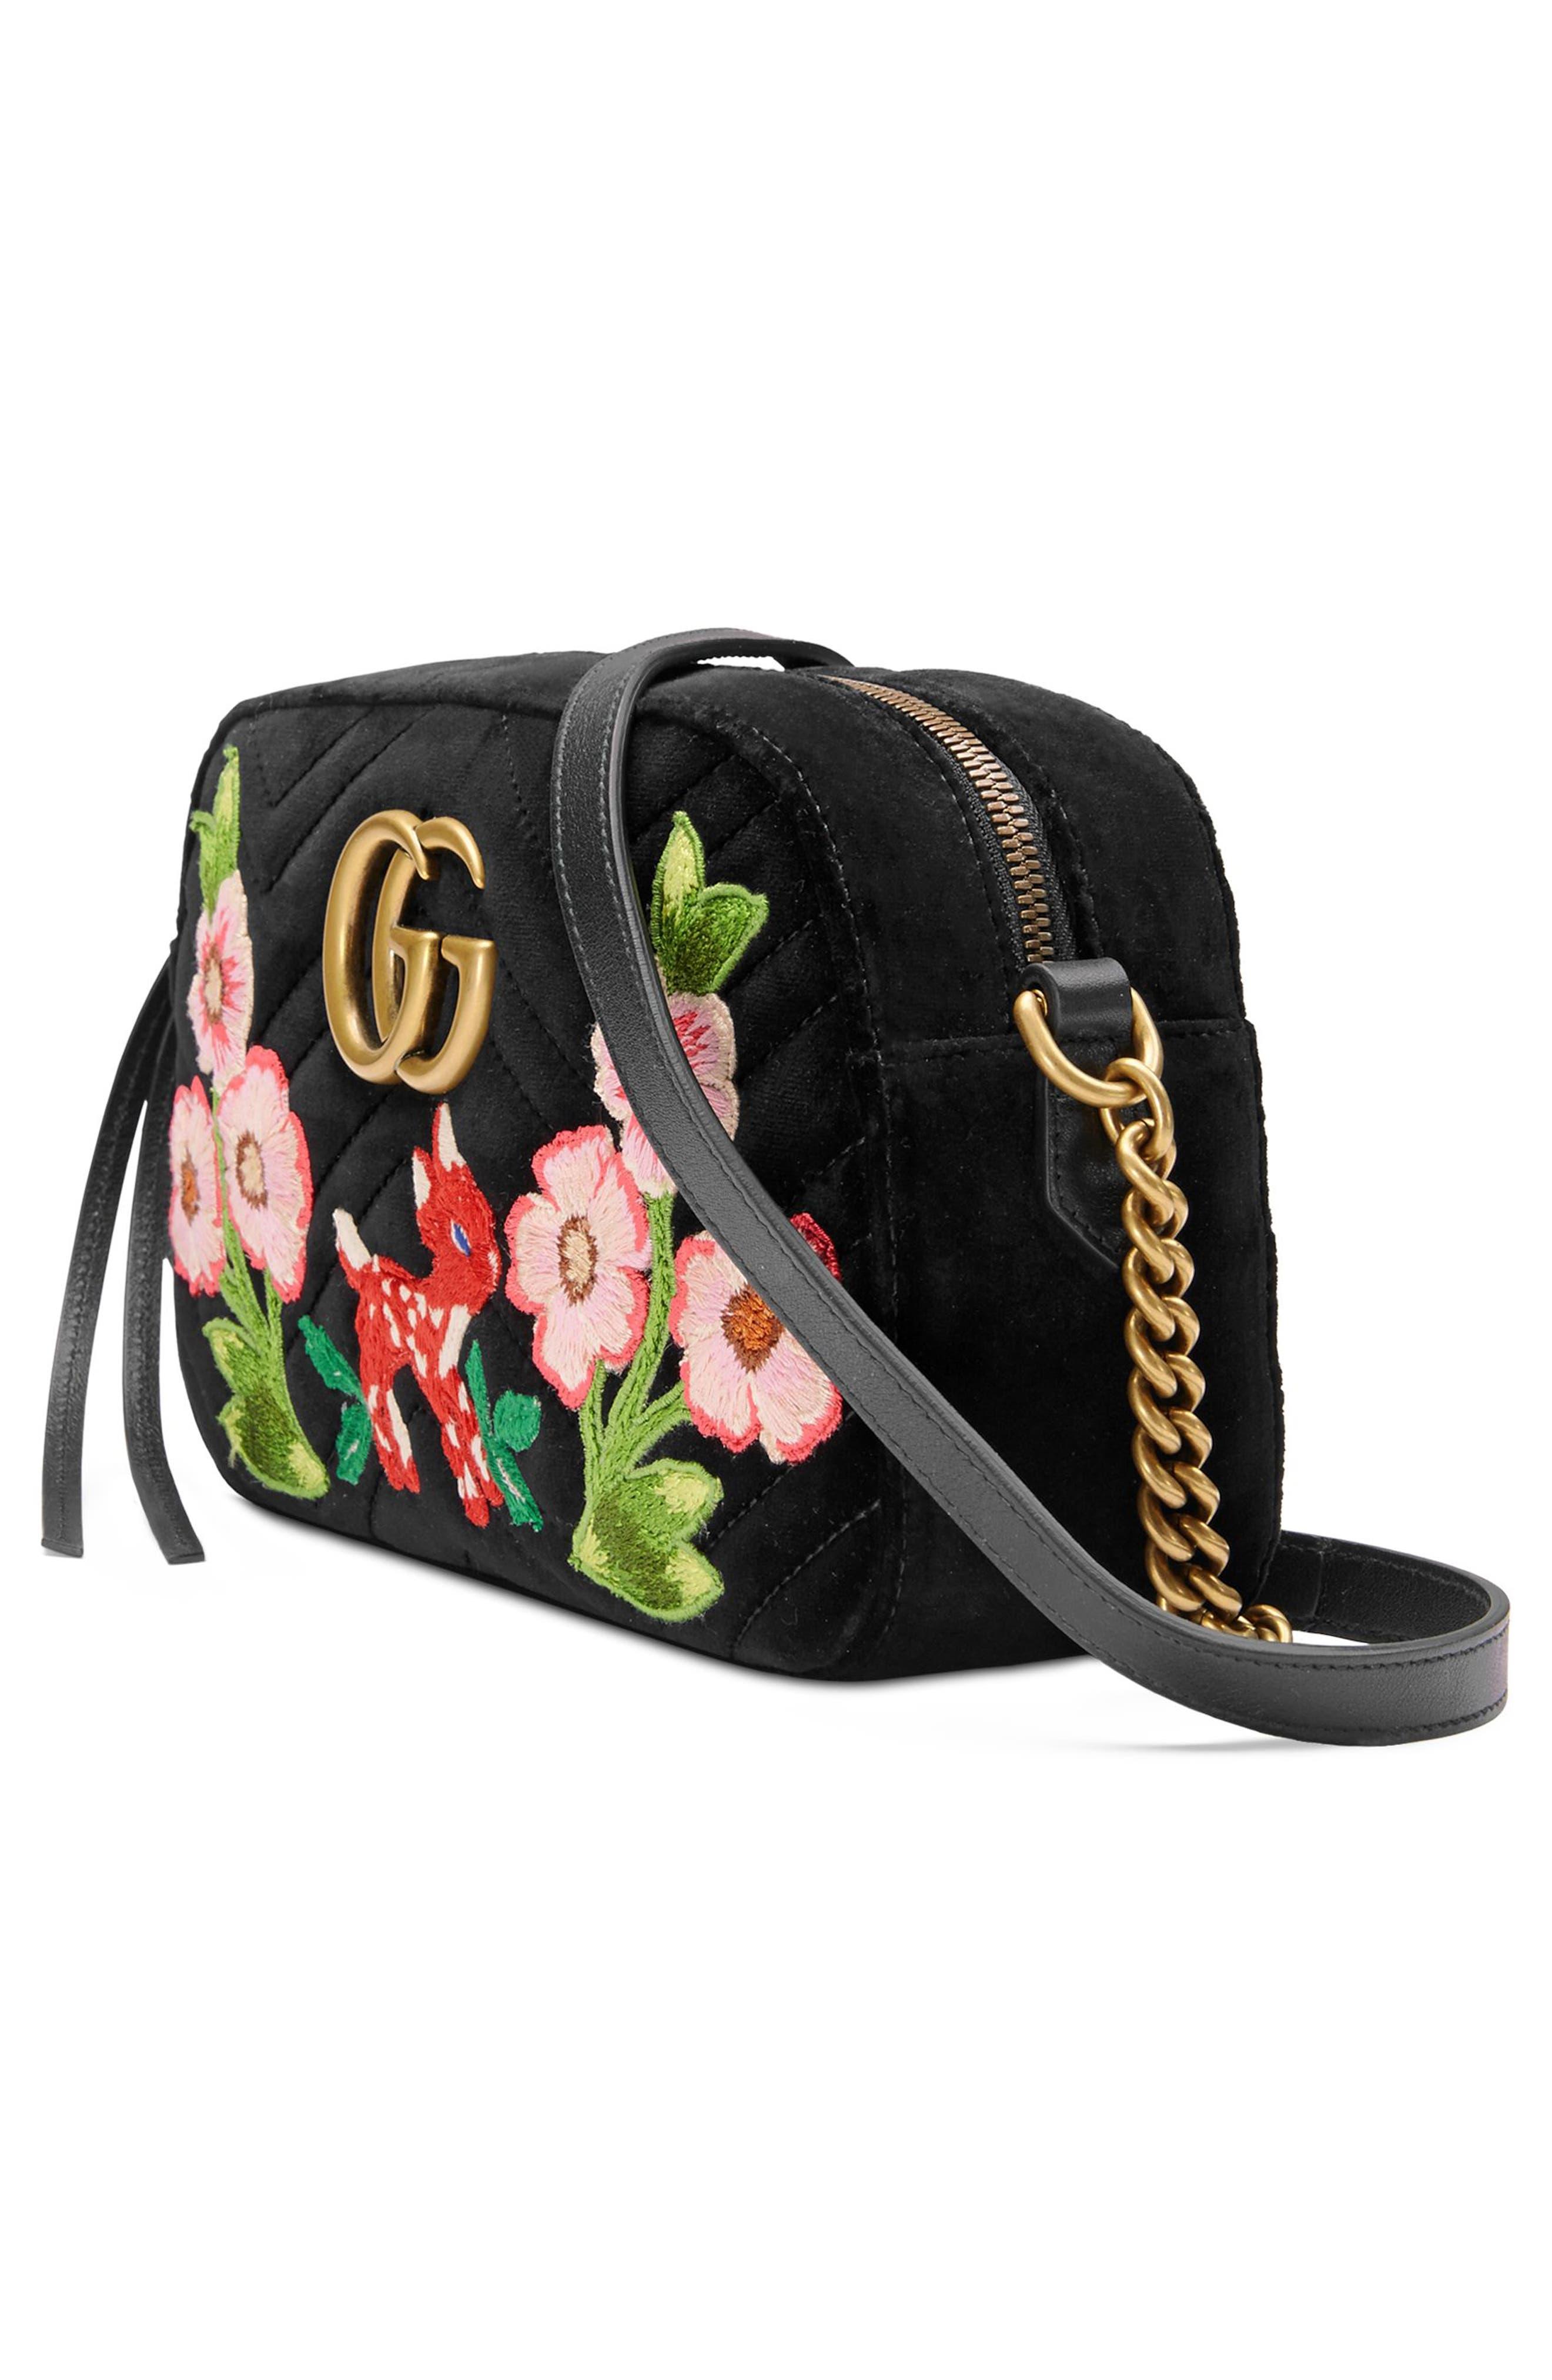 Small GG Marmont 2.0 Matelassé Velvet Shoulder Bag,                             Alternate thumbnail 4, color,                             Nero/ Nero Multi